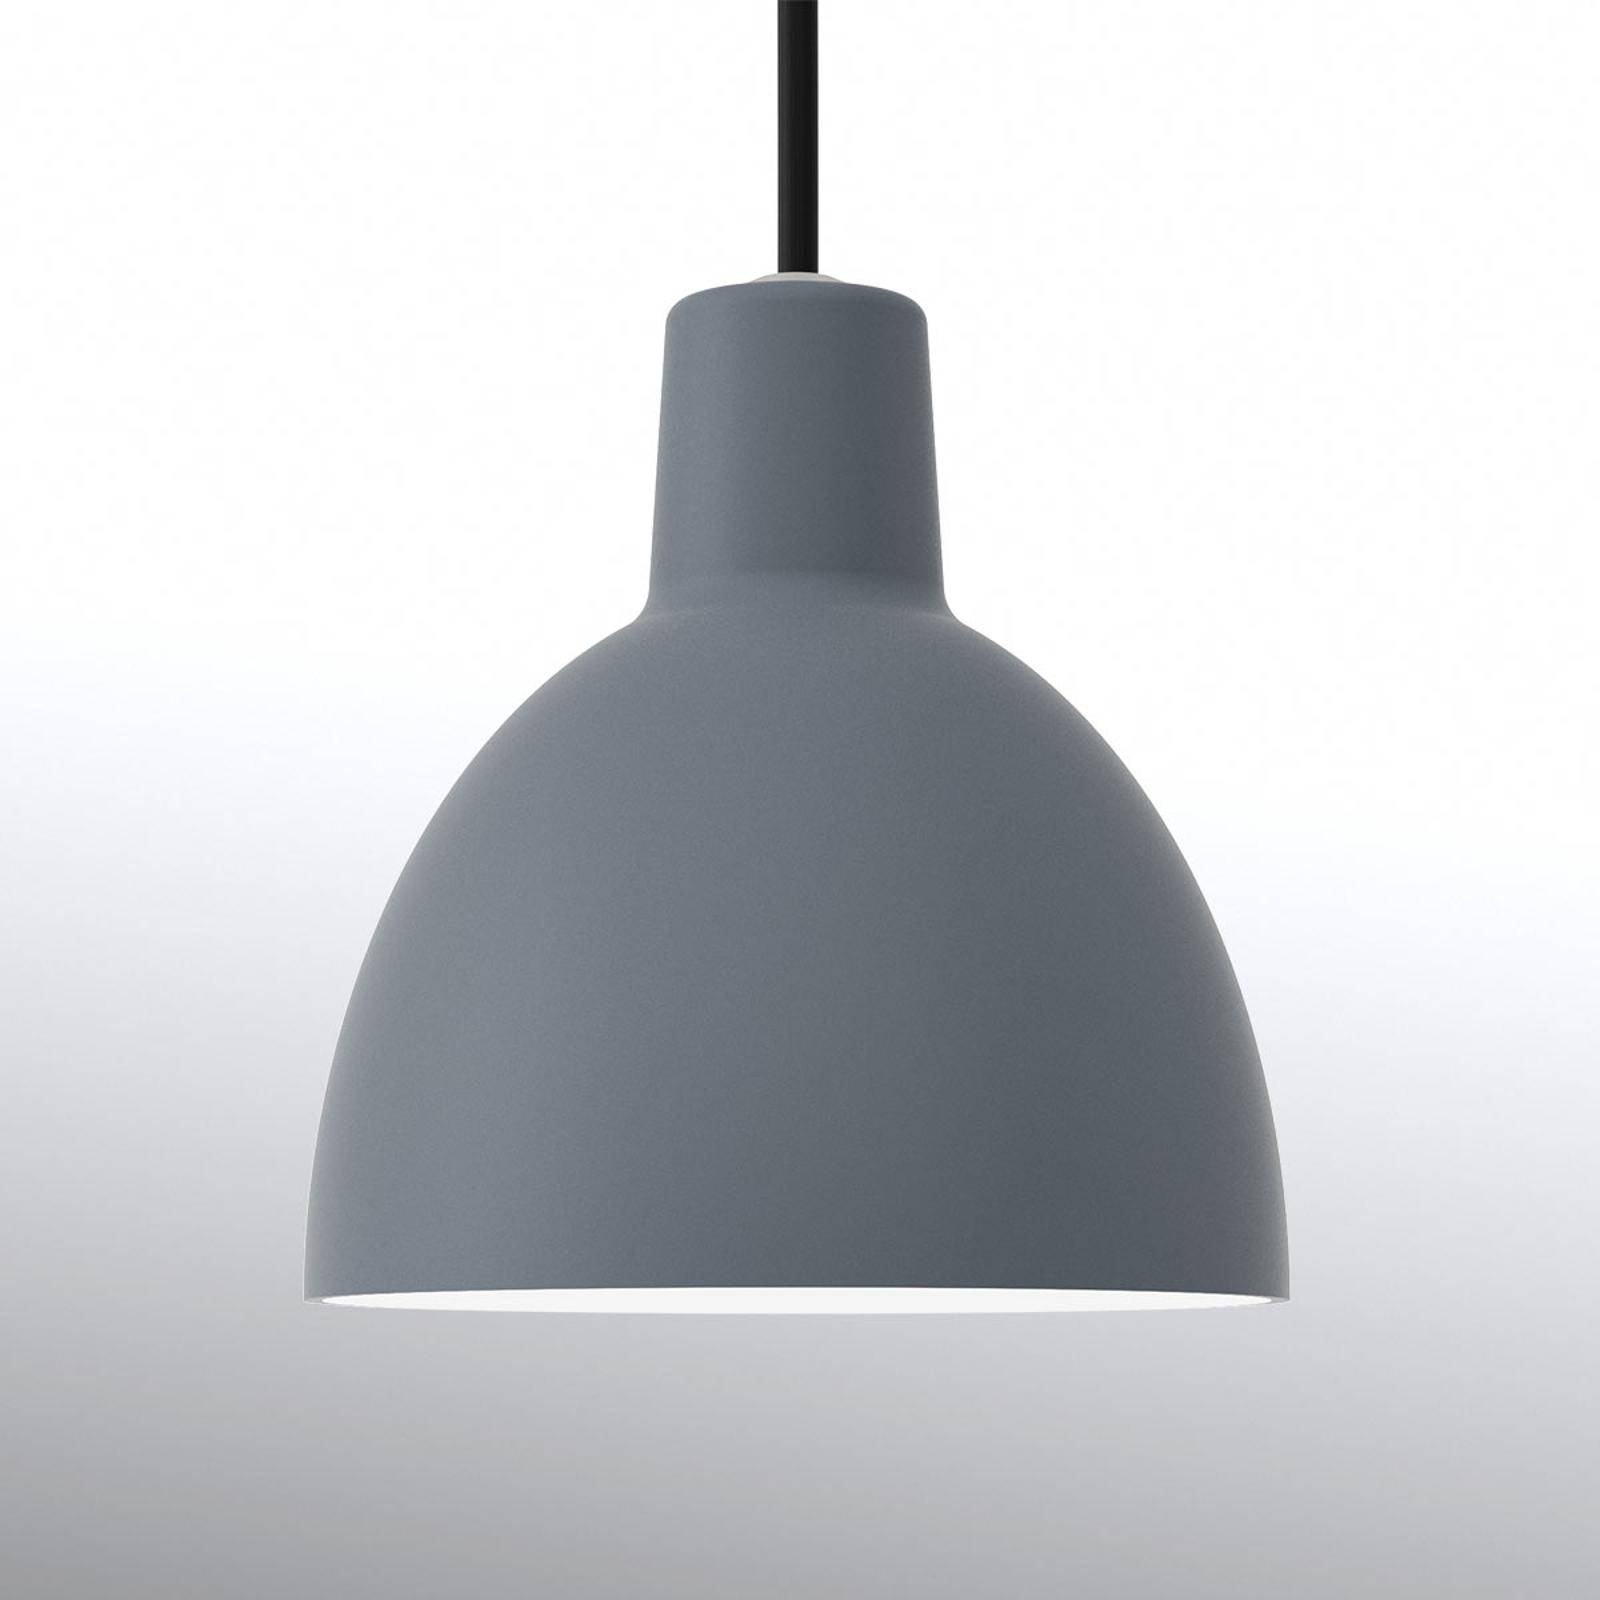 Minimalistische hanglamp Toldbod 120, blauwgrijs